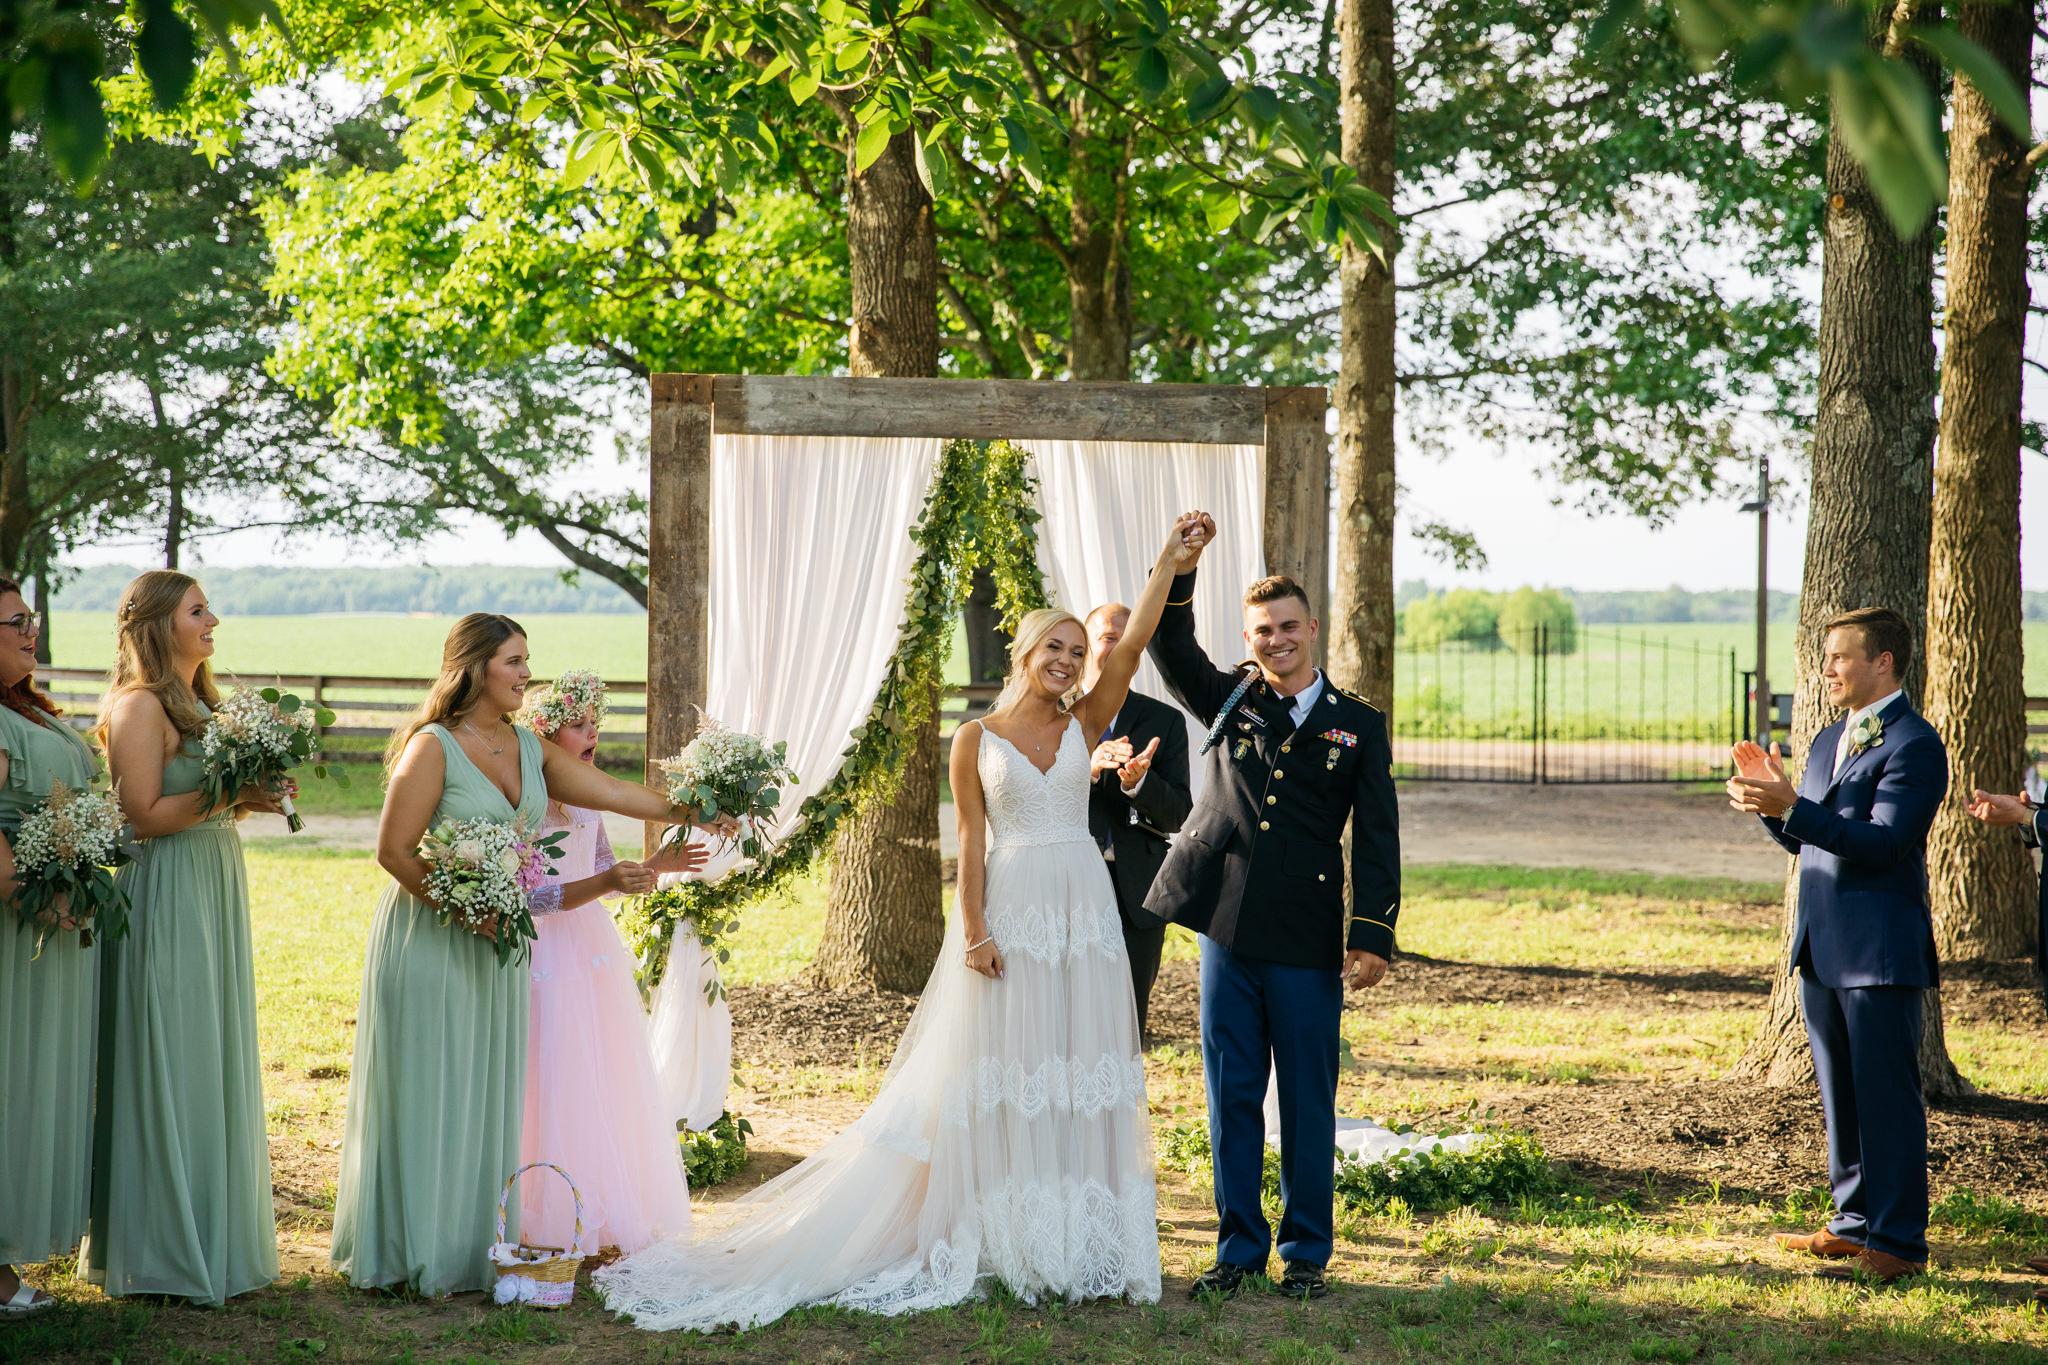 backyard-wedding-thewarmtharoundyou-lexy-branson-57.jpg